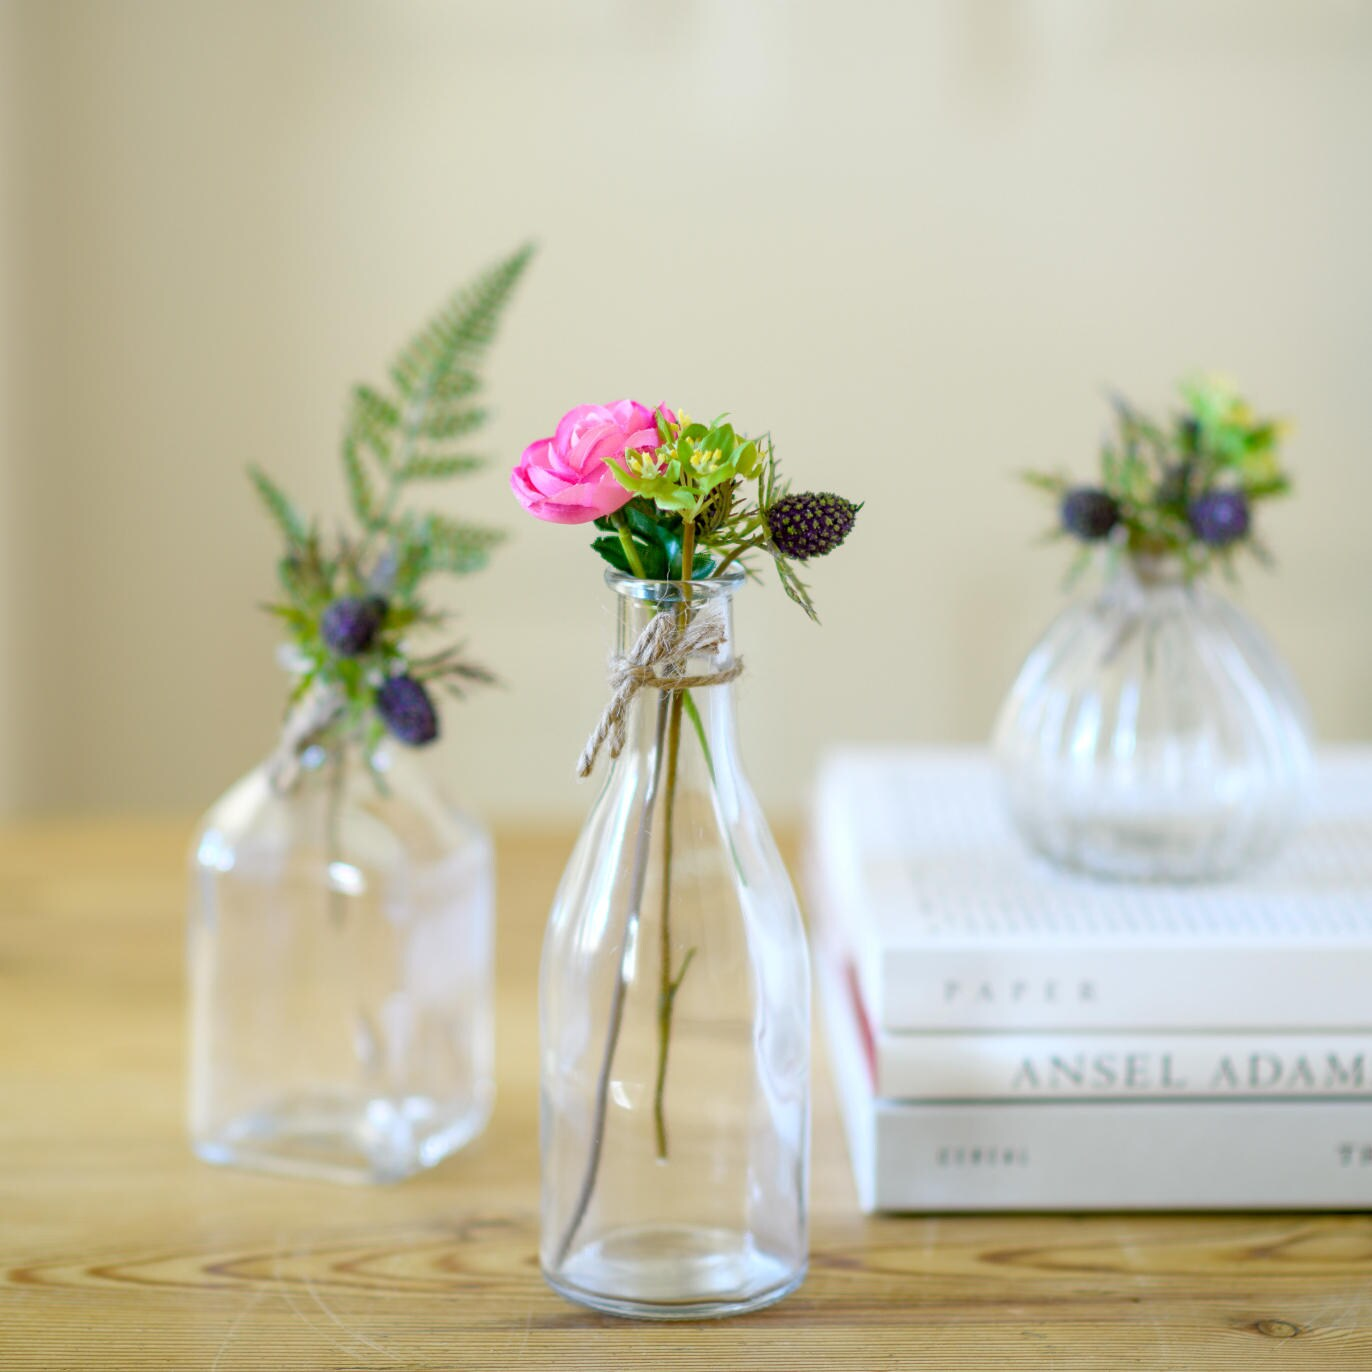 Bud flower vase centerpiece vintage wedding bud vase request a custom order and have something made just for you reviewsmspy